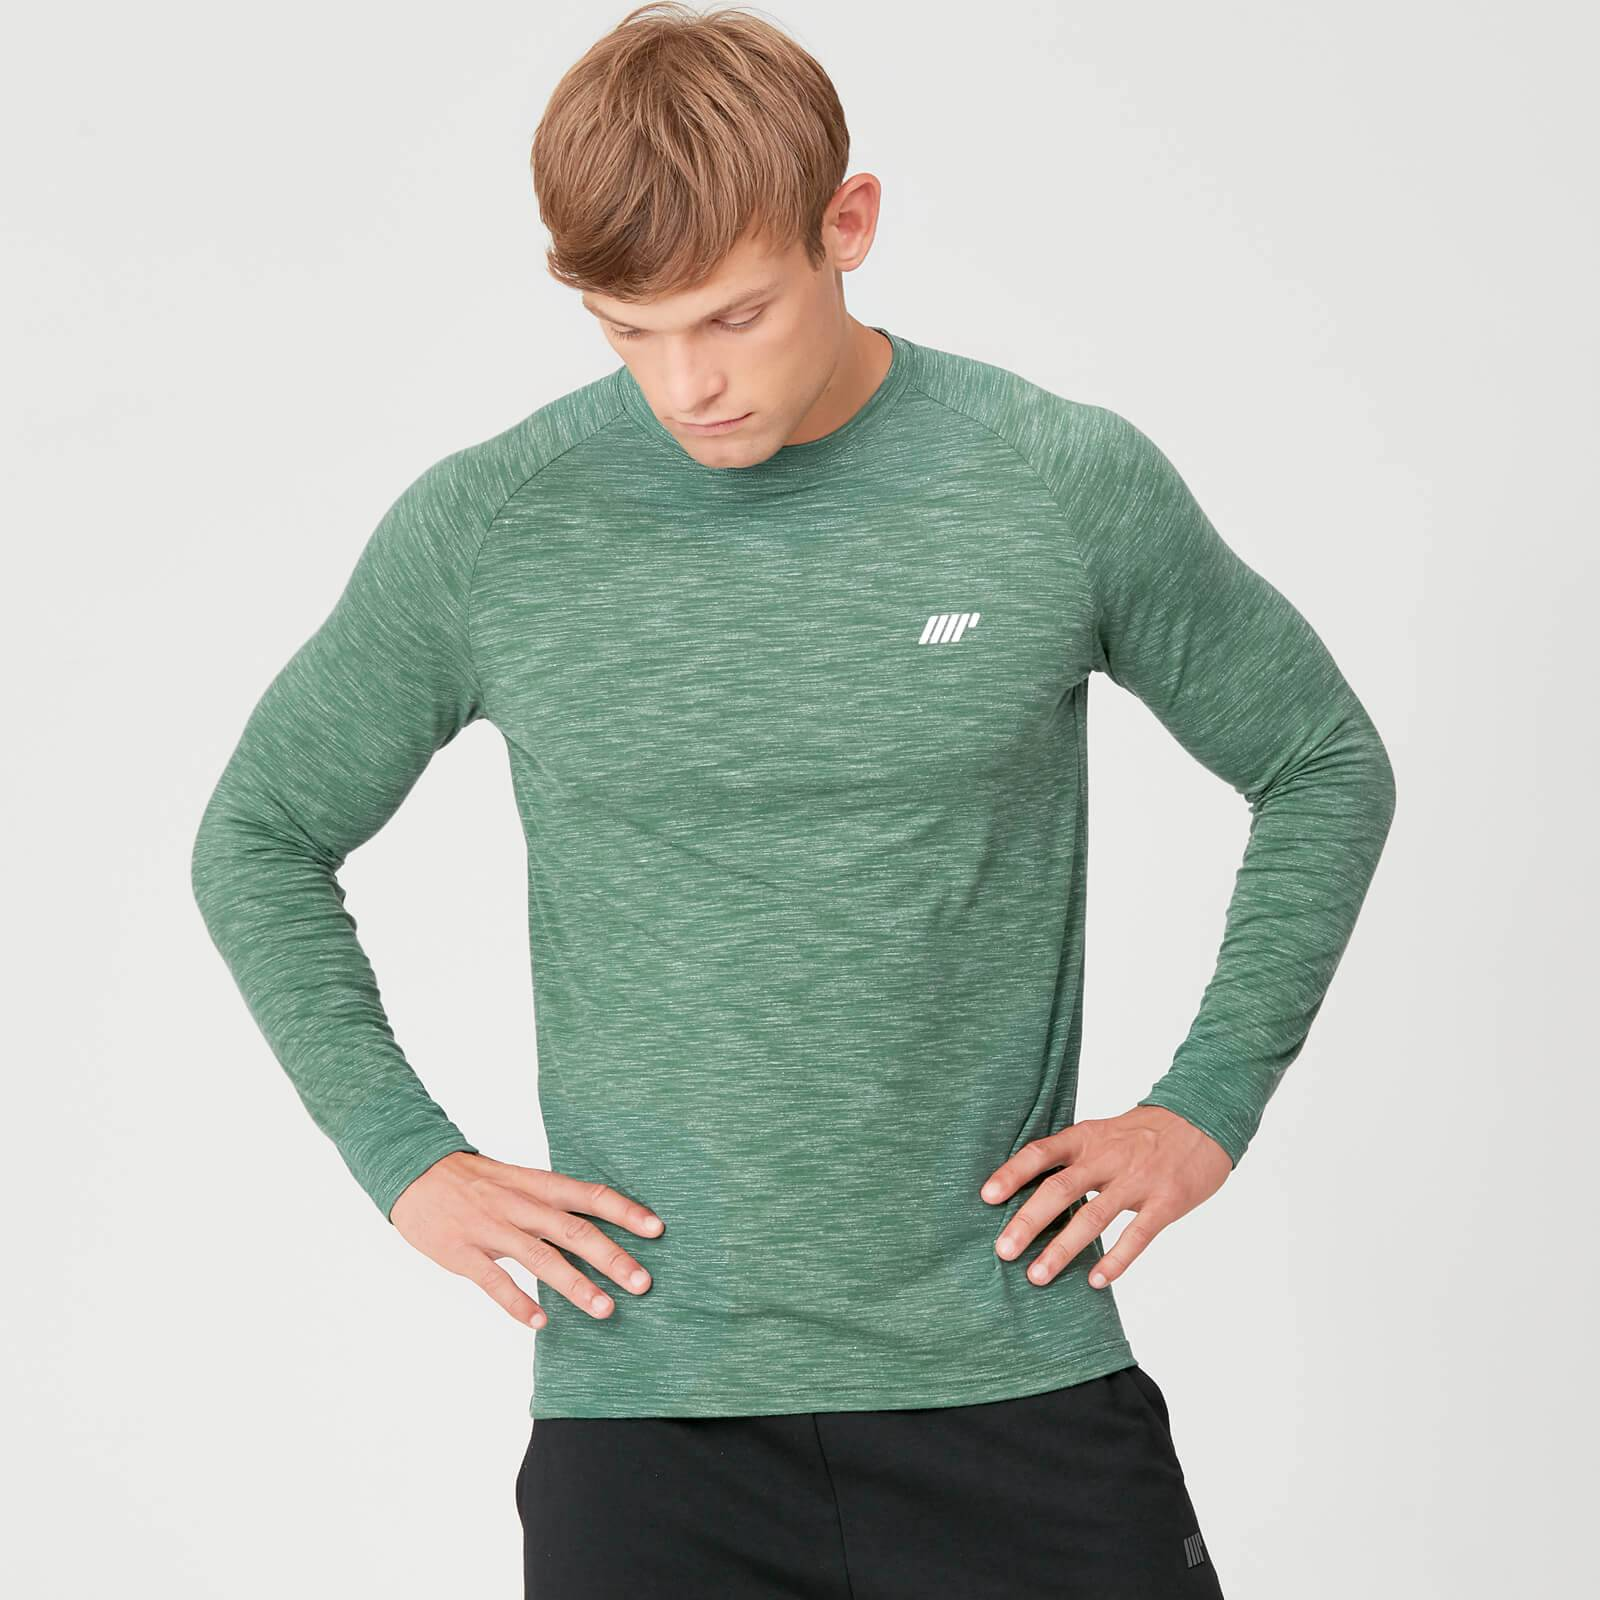 Myprotein Performance Long Sleeve T-Shirt - Green Marl - S